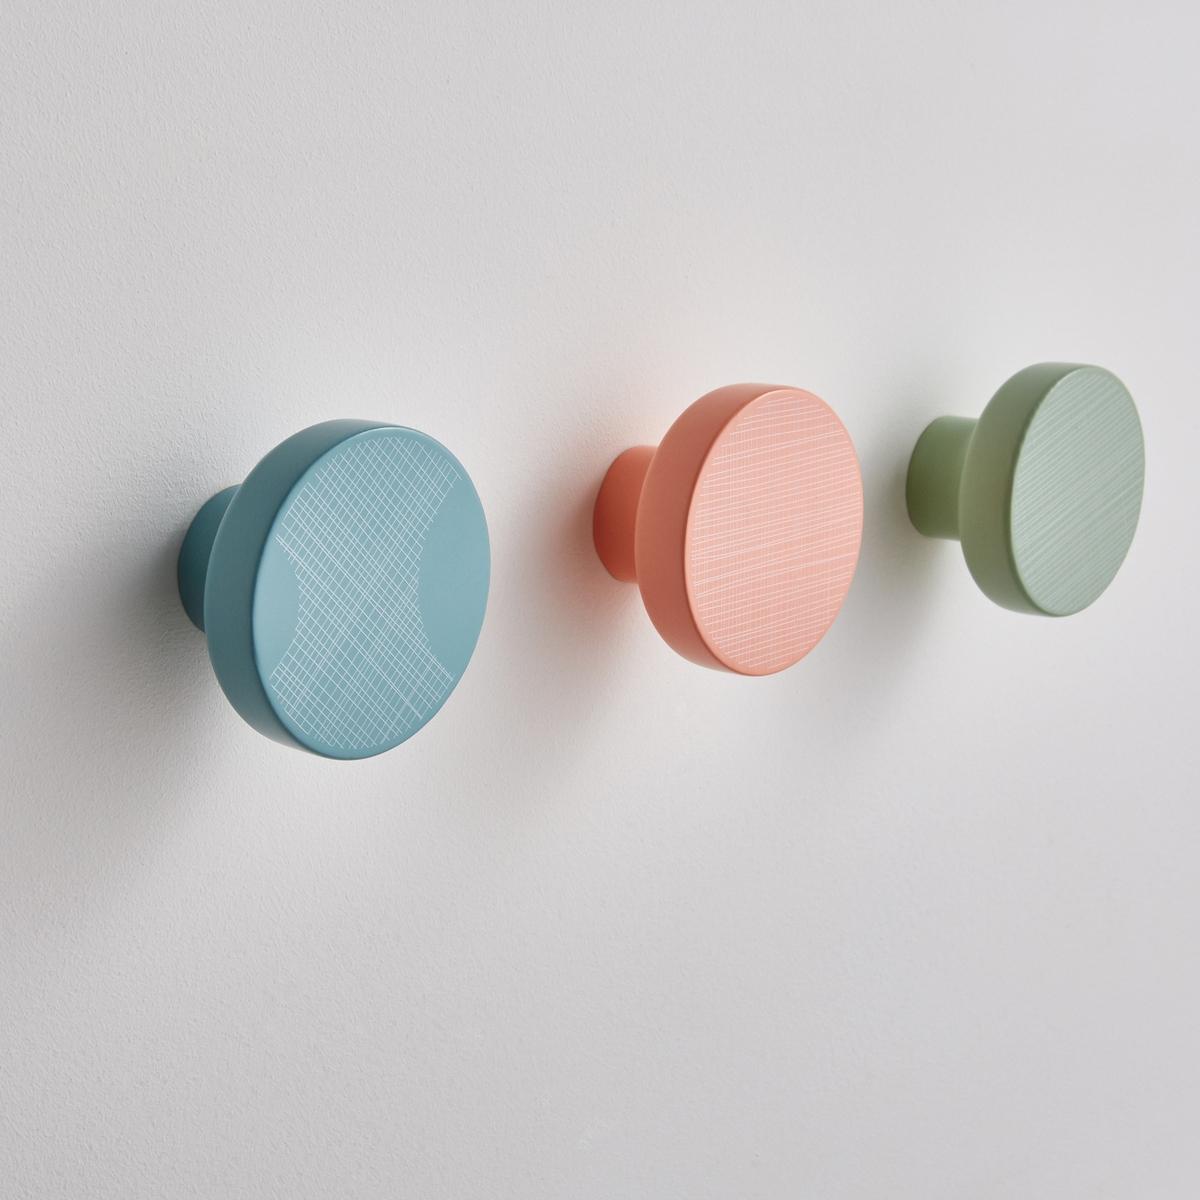 Комплект из 3 крючков Eclipse от La Redoute